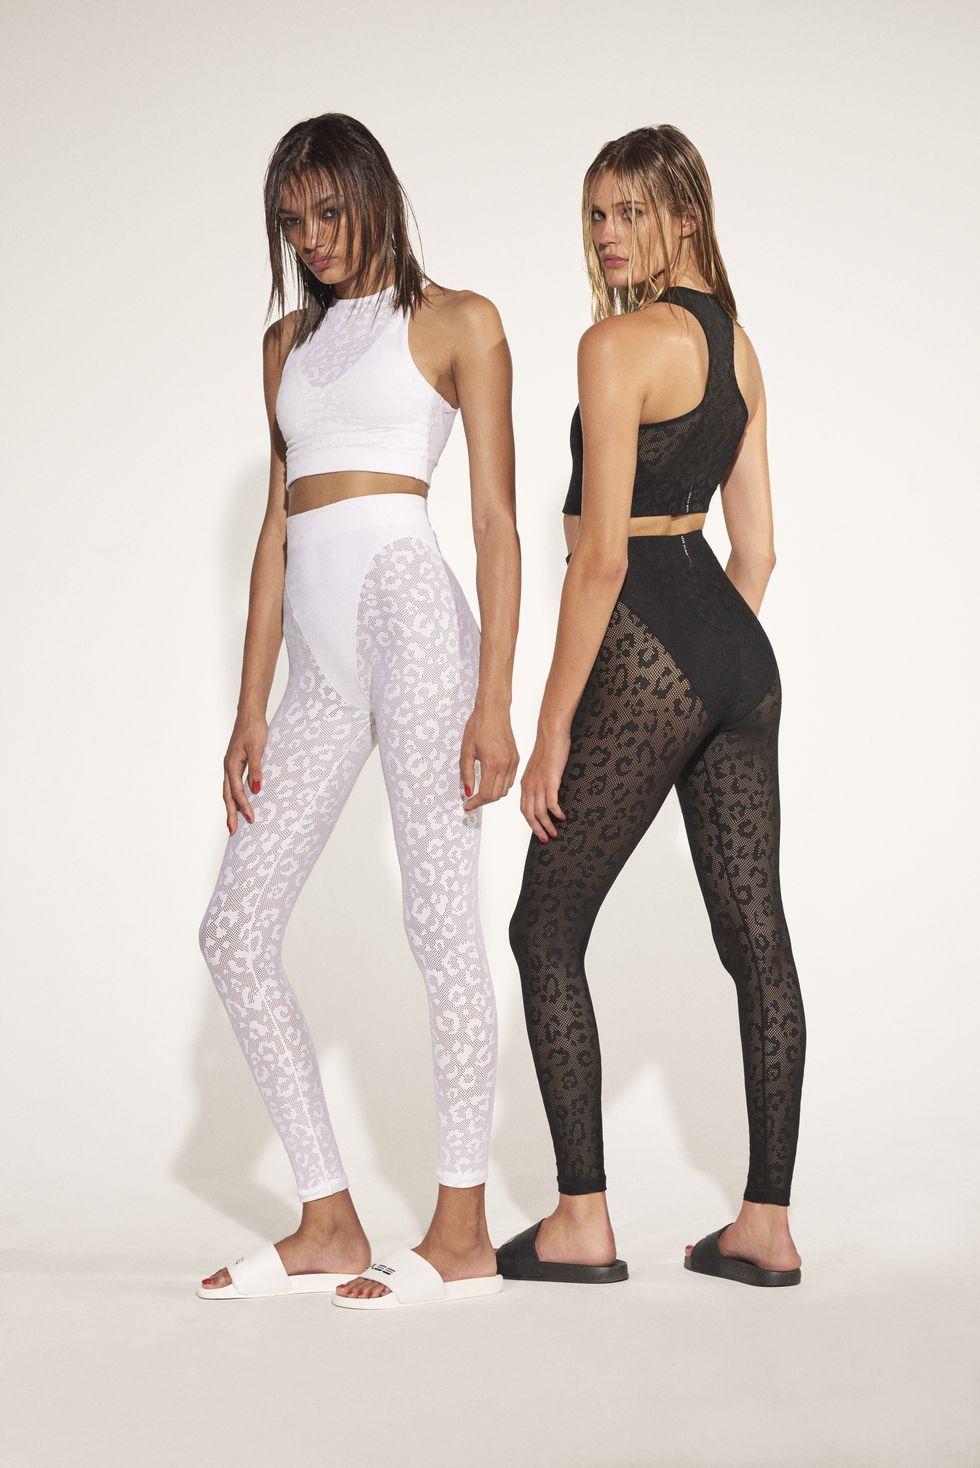 Adam Selman's New Sportswear Collection Looks So Good It